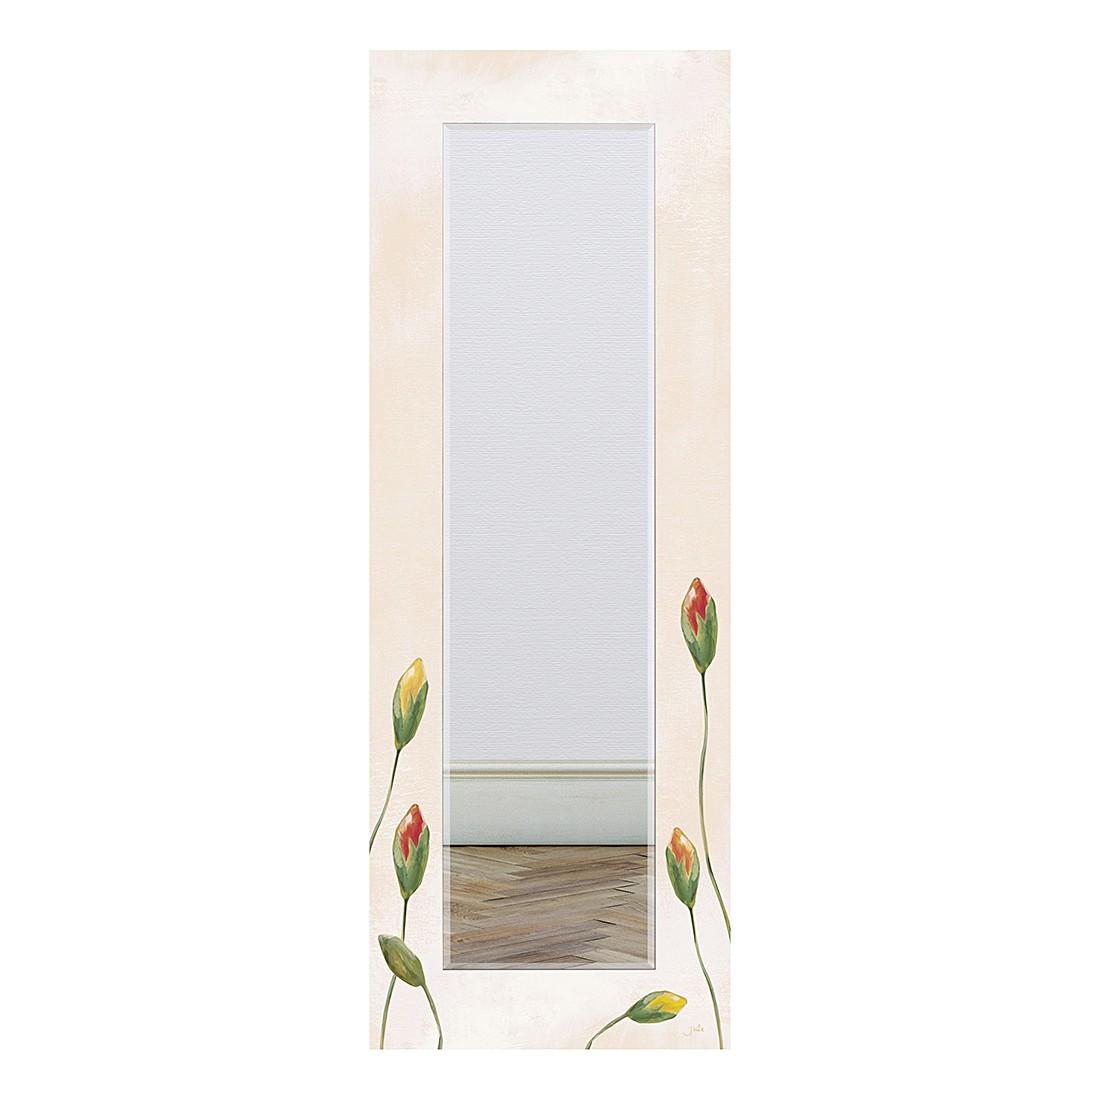 Wandspiegel Colorful Poppies – Floral, Artland jetzt bestellen